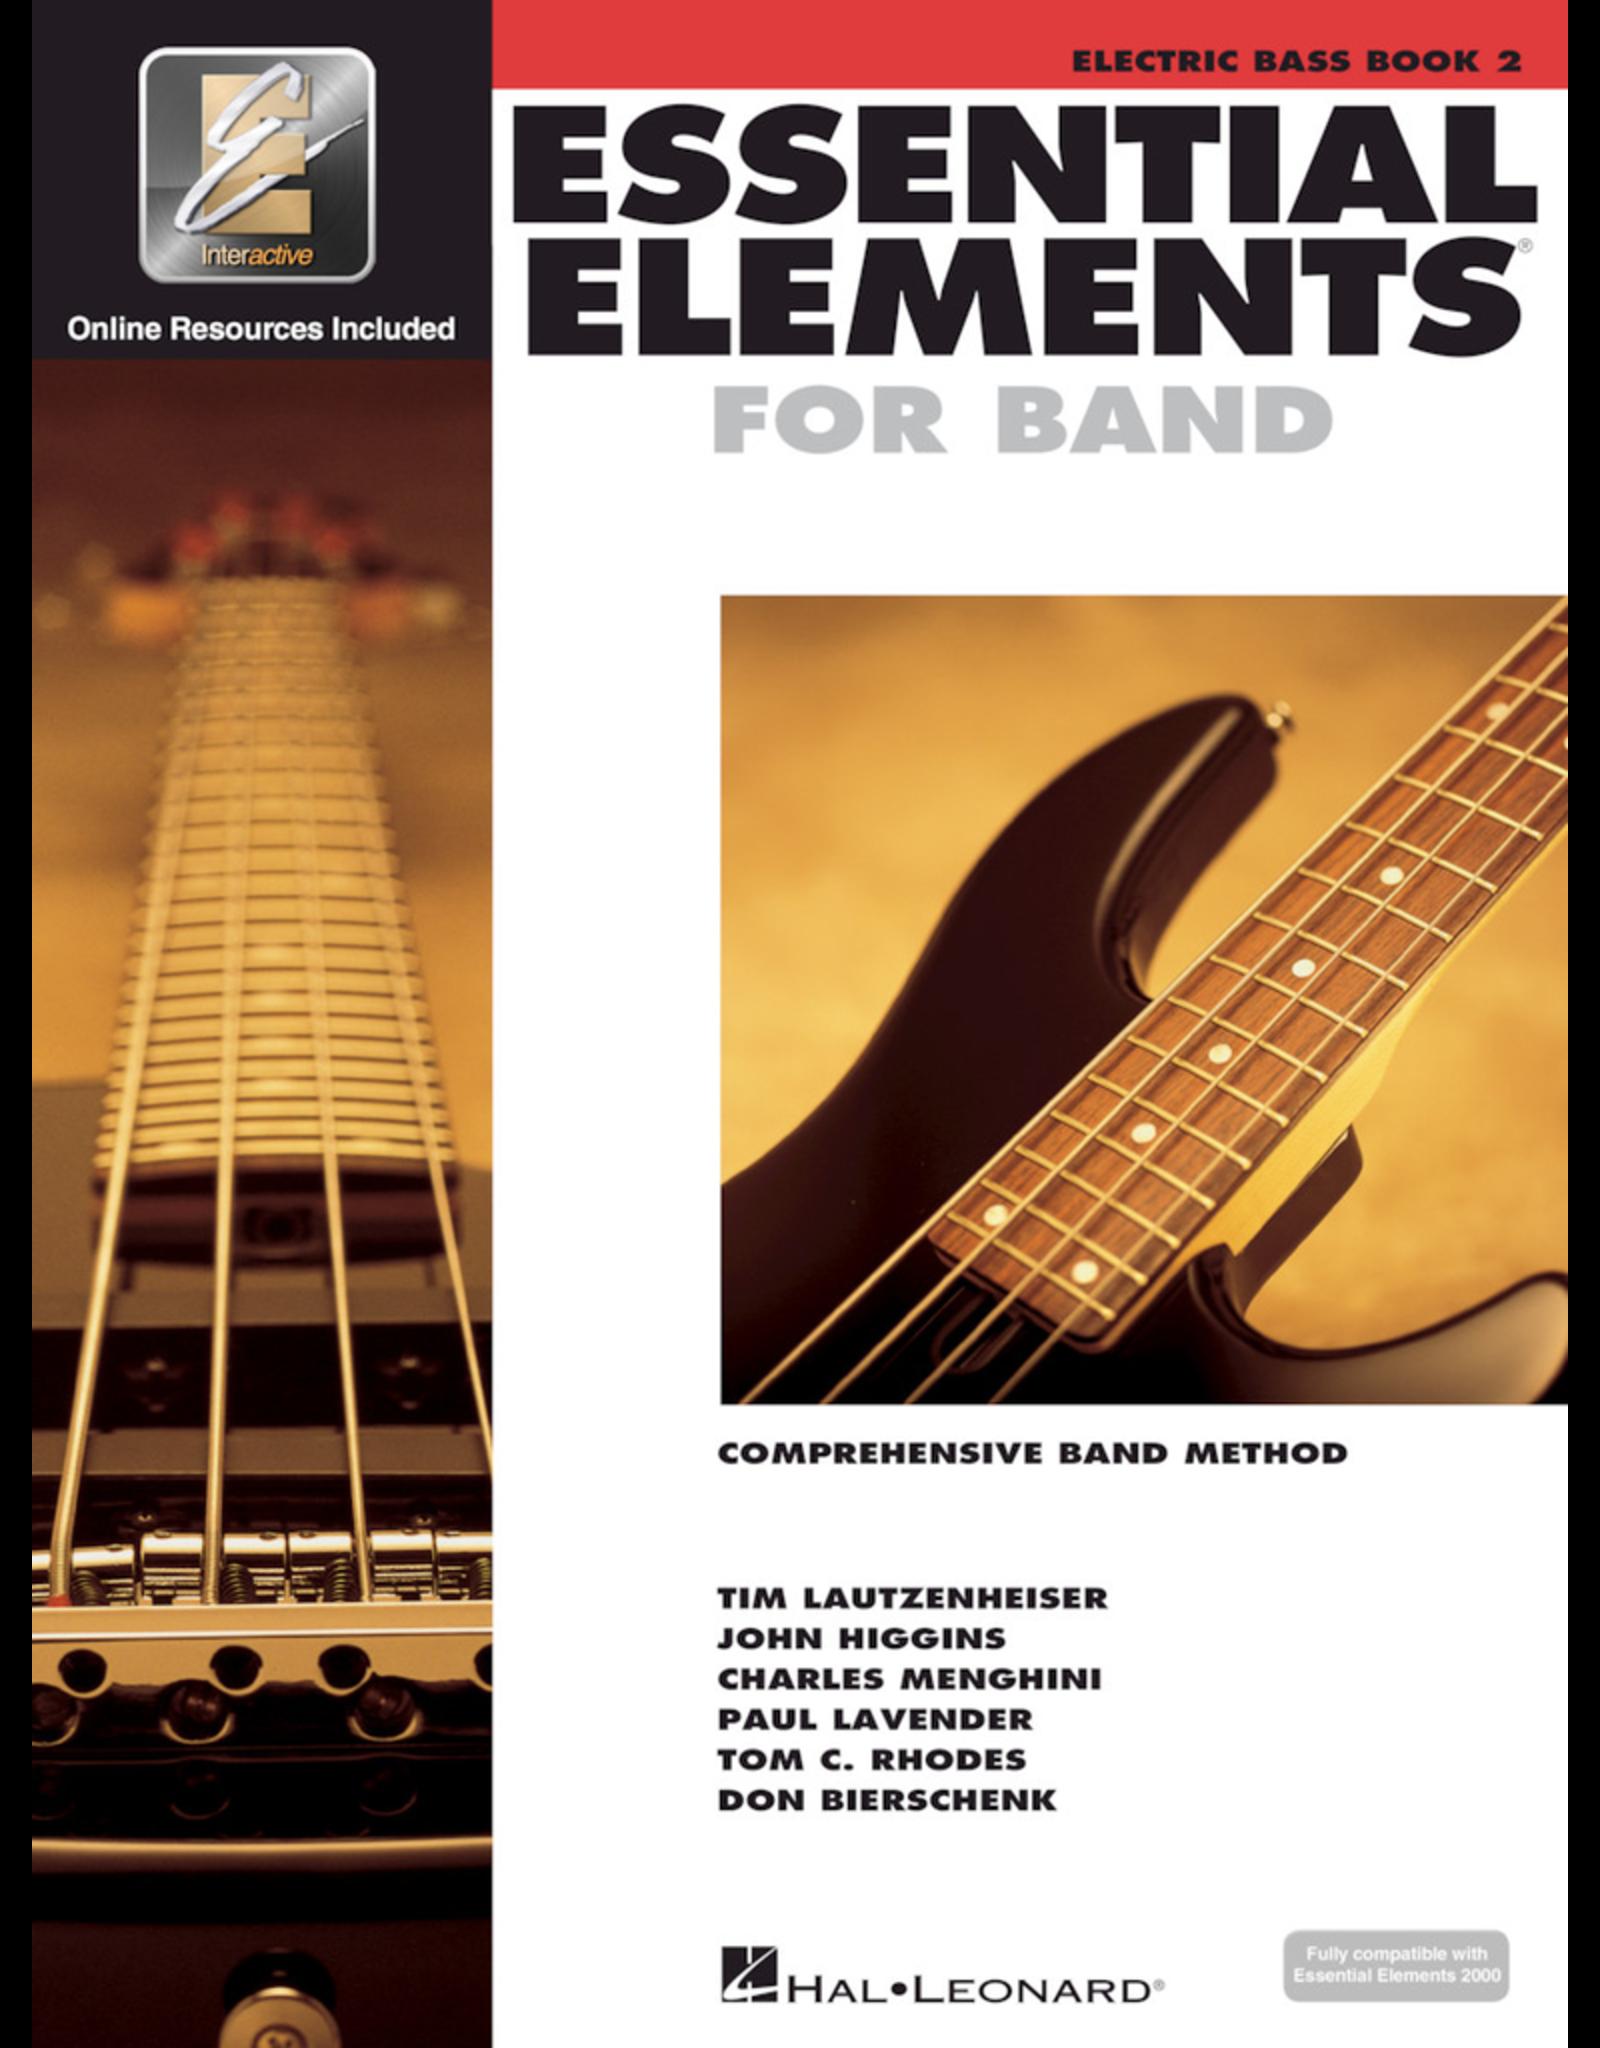 Hal Leonard Essential Elements Book 2 Electric Bass